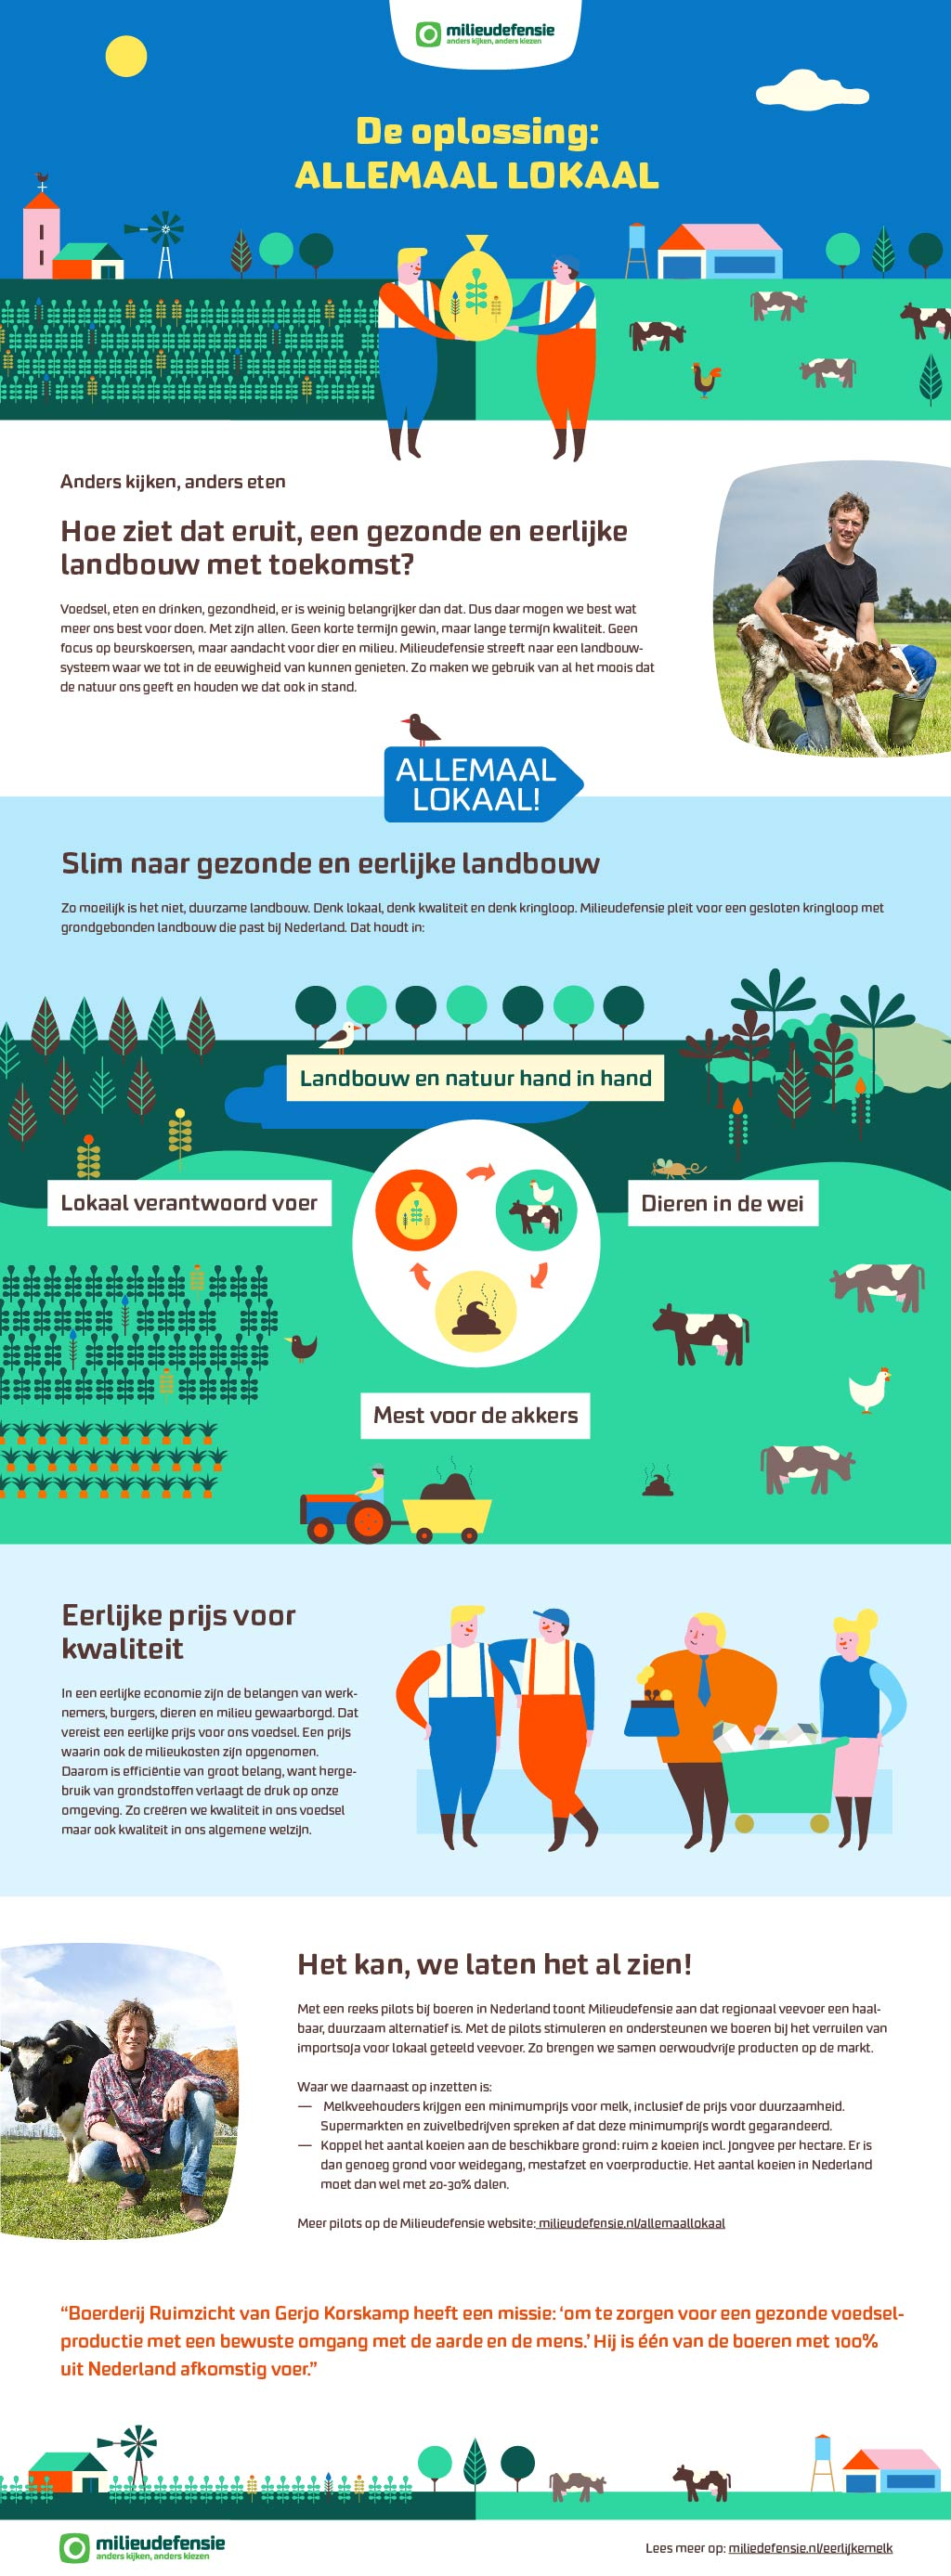 Milieudefensie-infographic-melk-act-impact-03